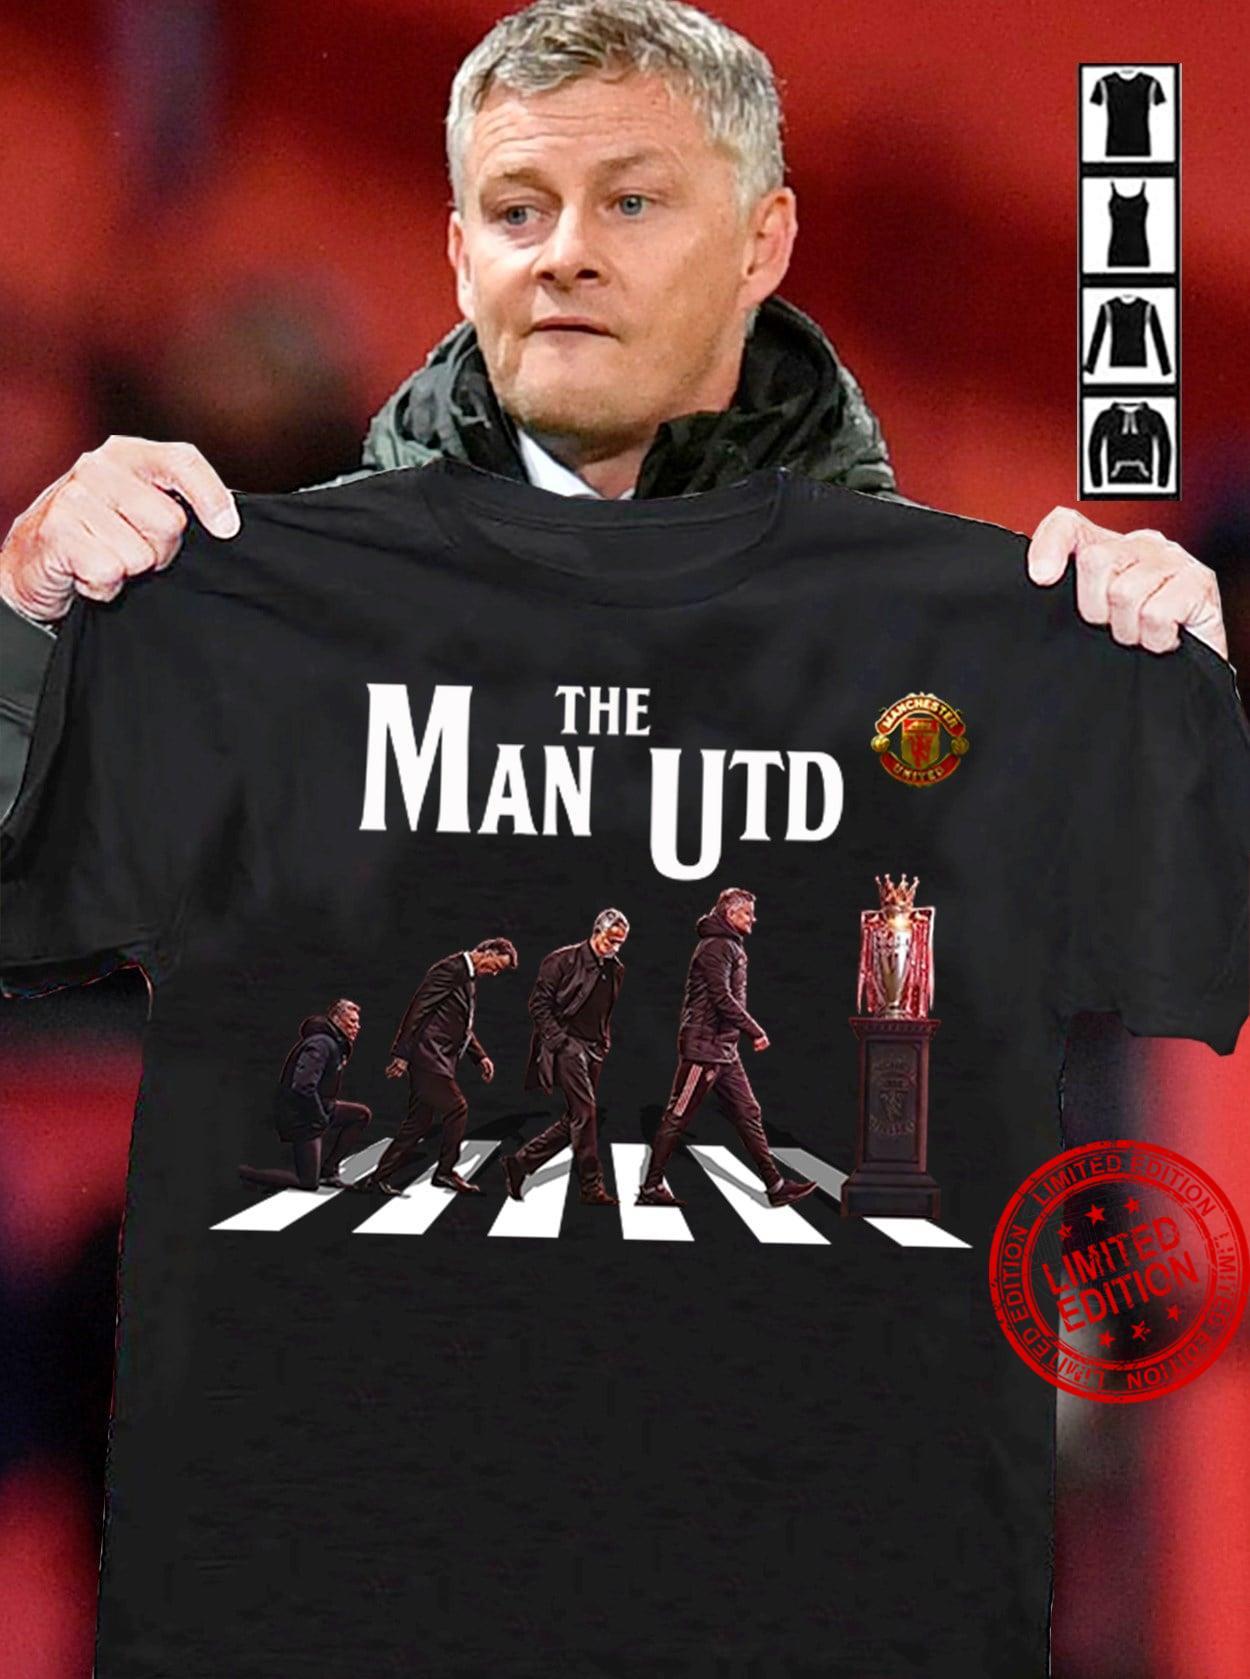 The Man Utd Abbey Road Shirt